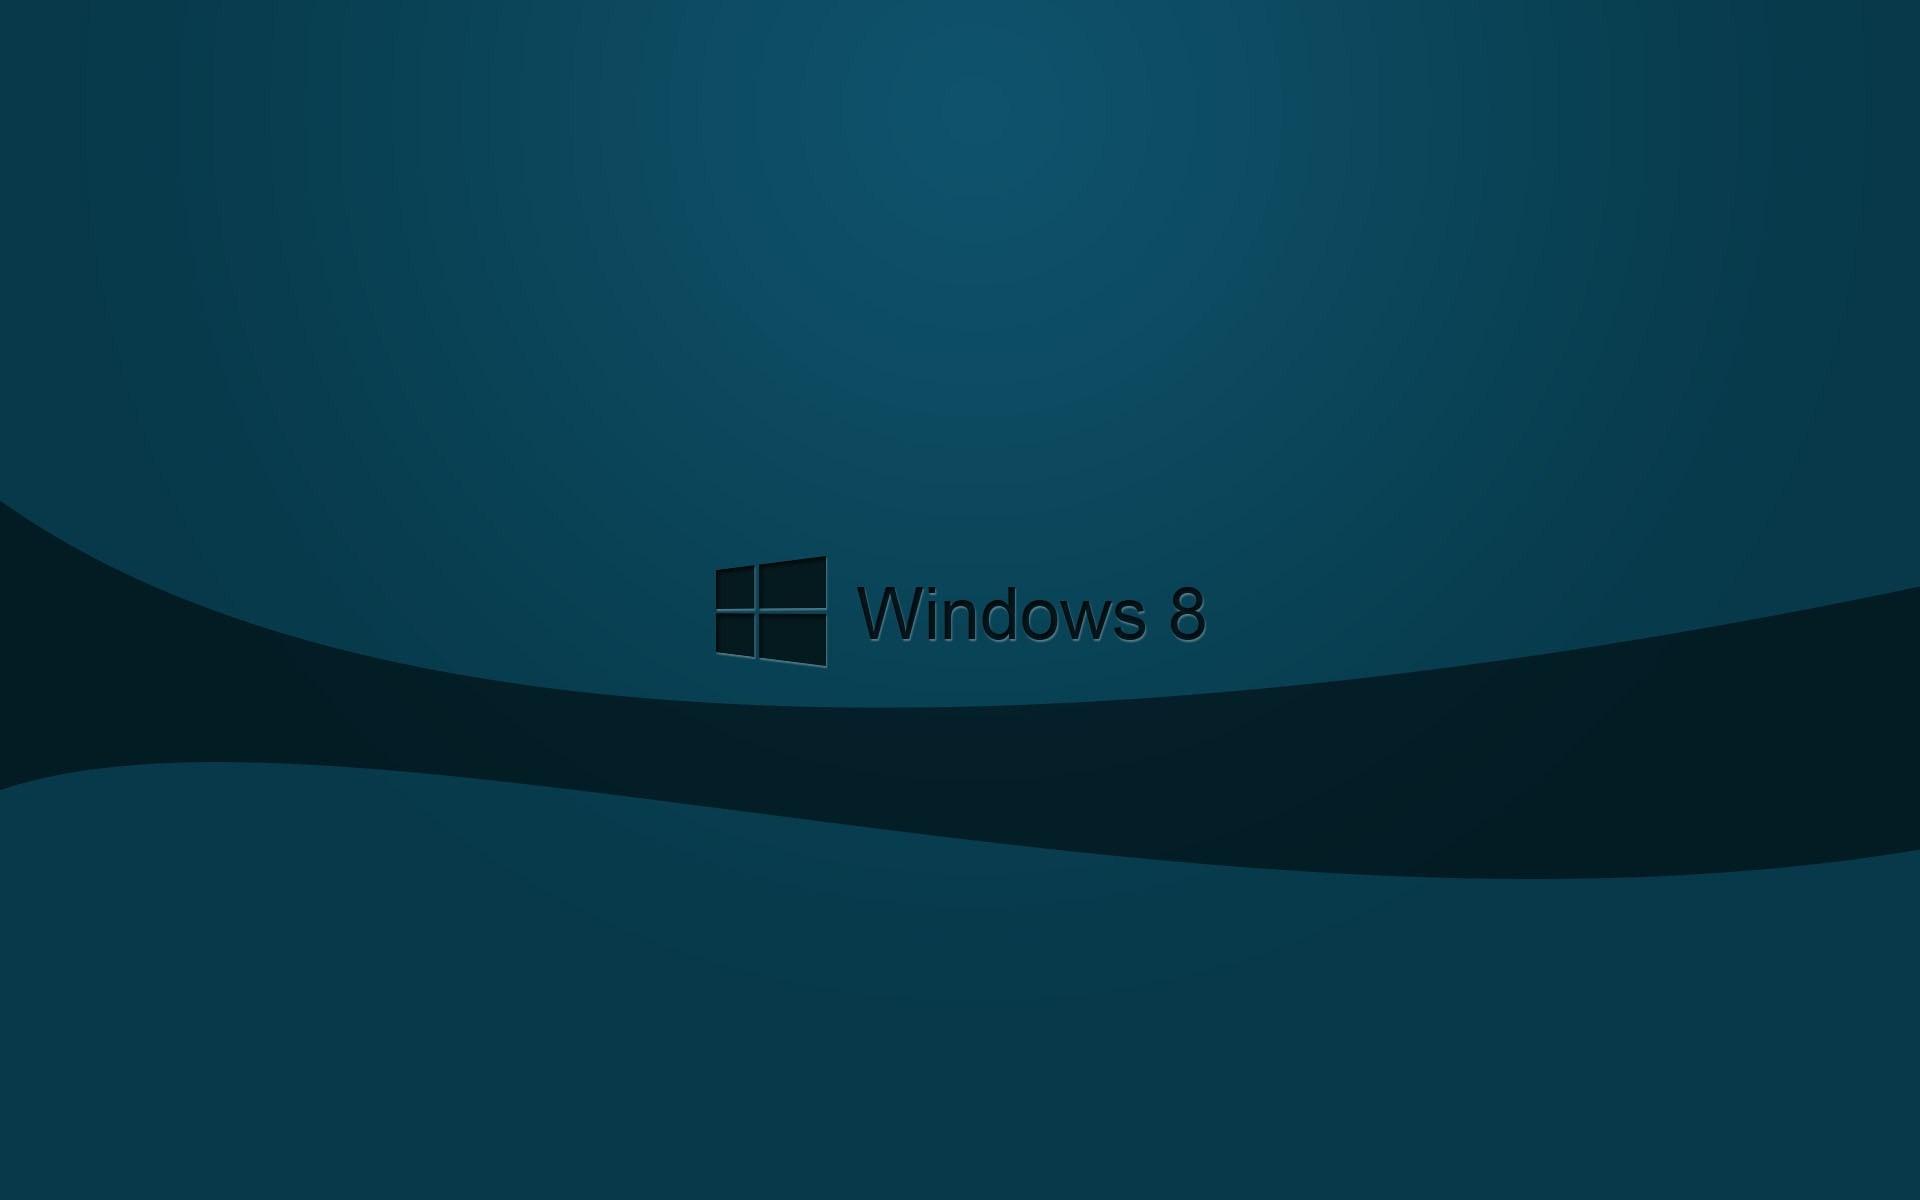 44 2k wallpaper windows 10 on wallpapersafari - Windows 10 4k wallpaper pack ...